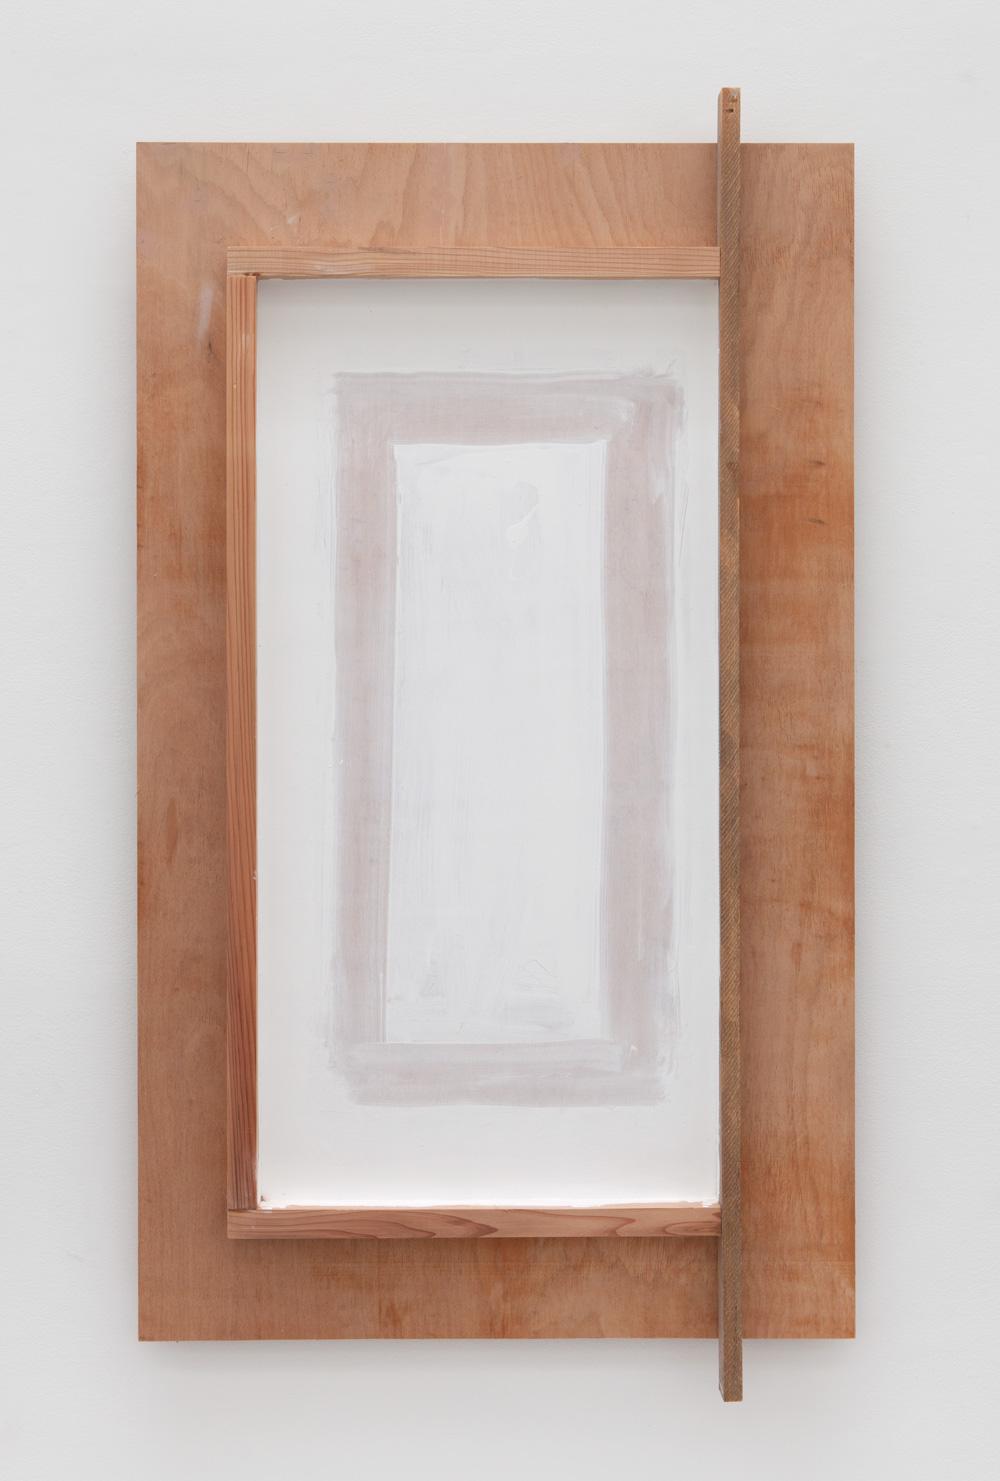 Law of Internal Latencies , 2015 内潜律 ( Naisenritsu ) Wood, paint 63 5/8 x 35 3/8 x 4 inches 161.6 x 89.9 x 10.2 cm